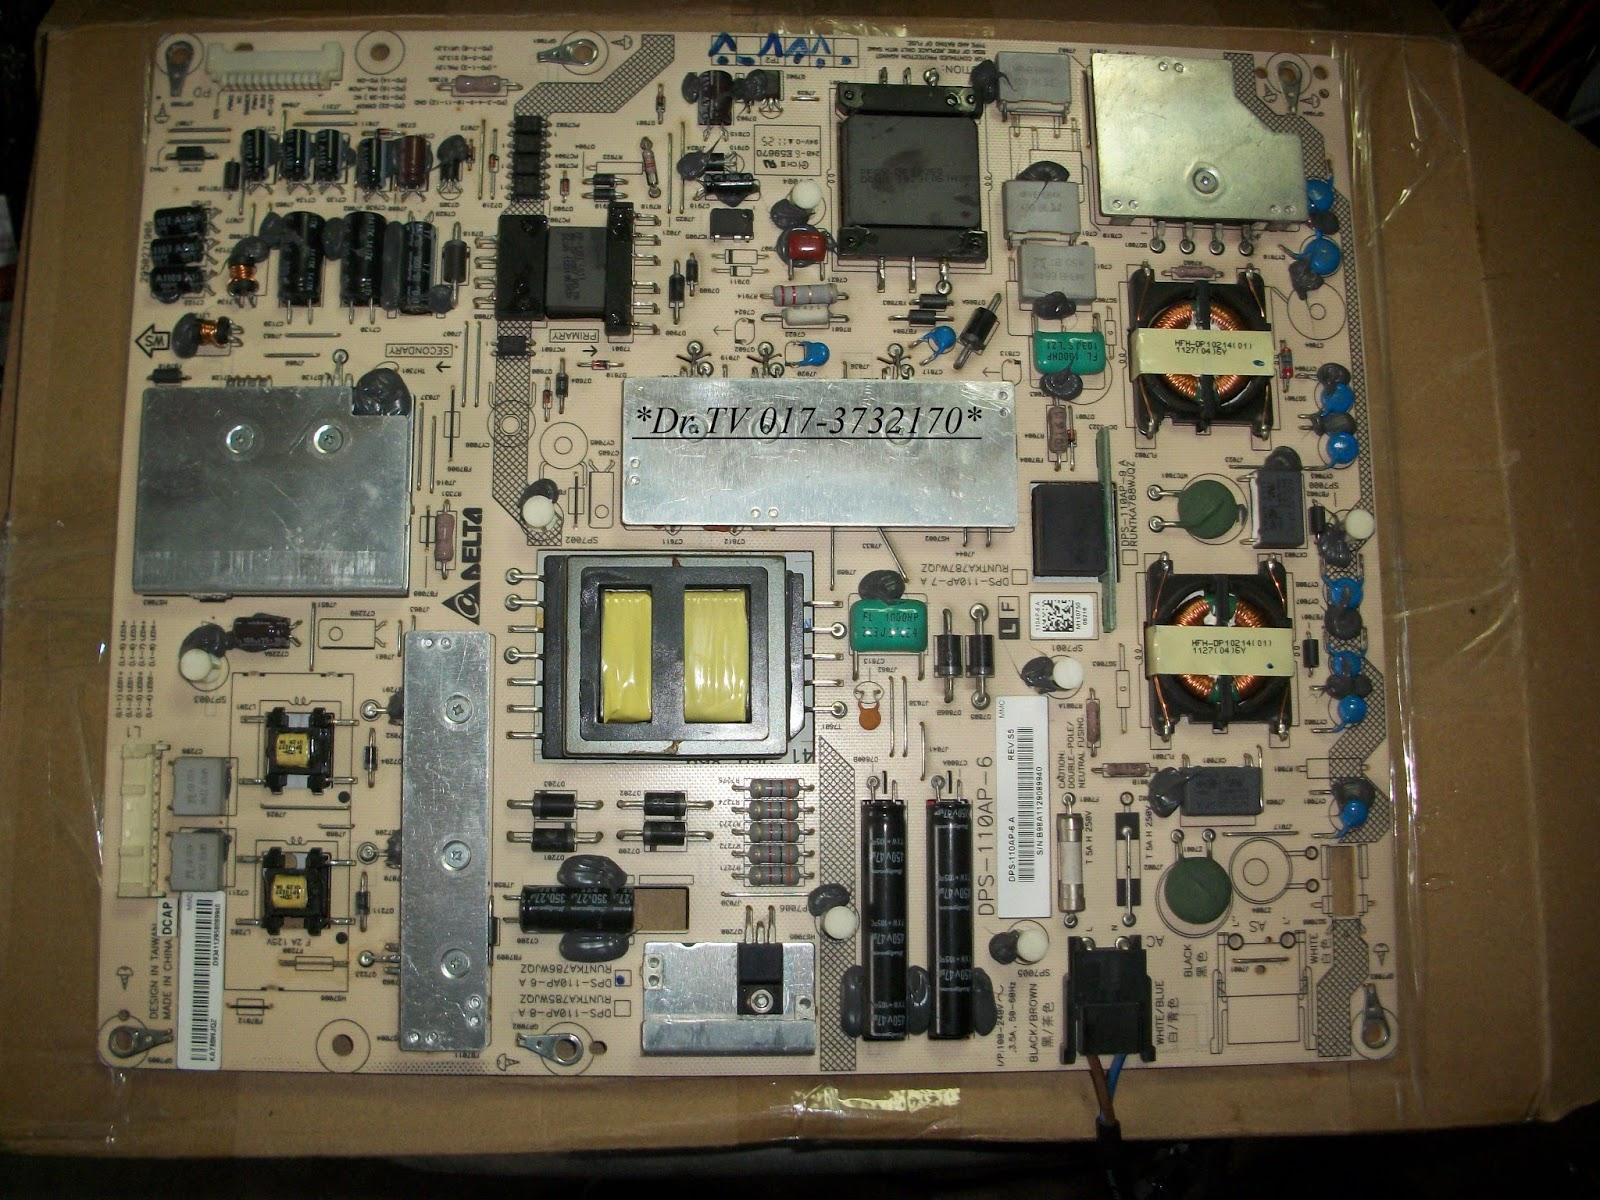 HOSPITAL Electronics TV Repairing And Sparepart: SPAREPART LED SHARP